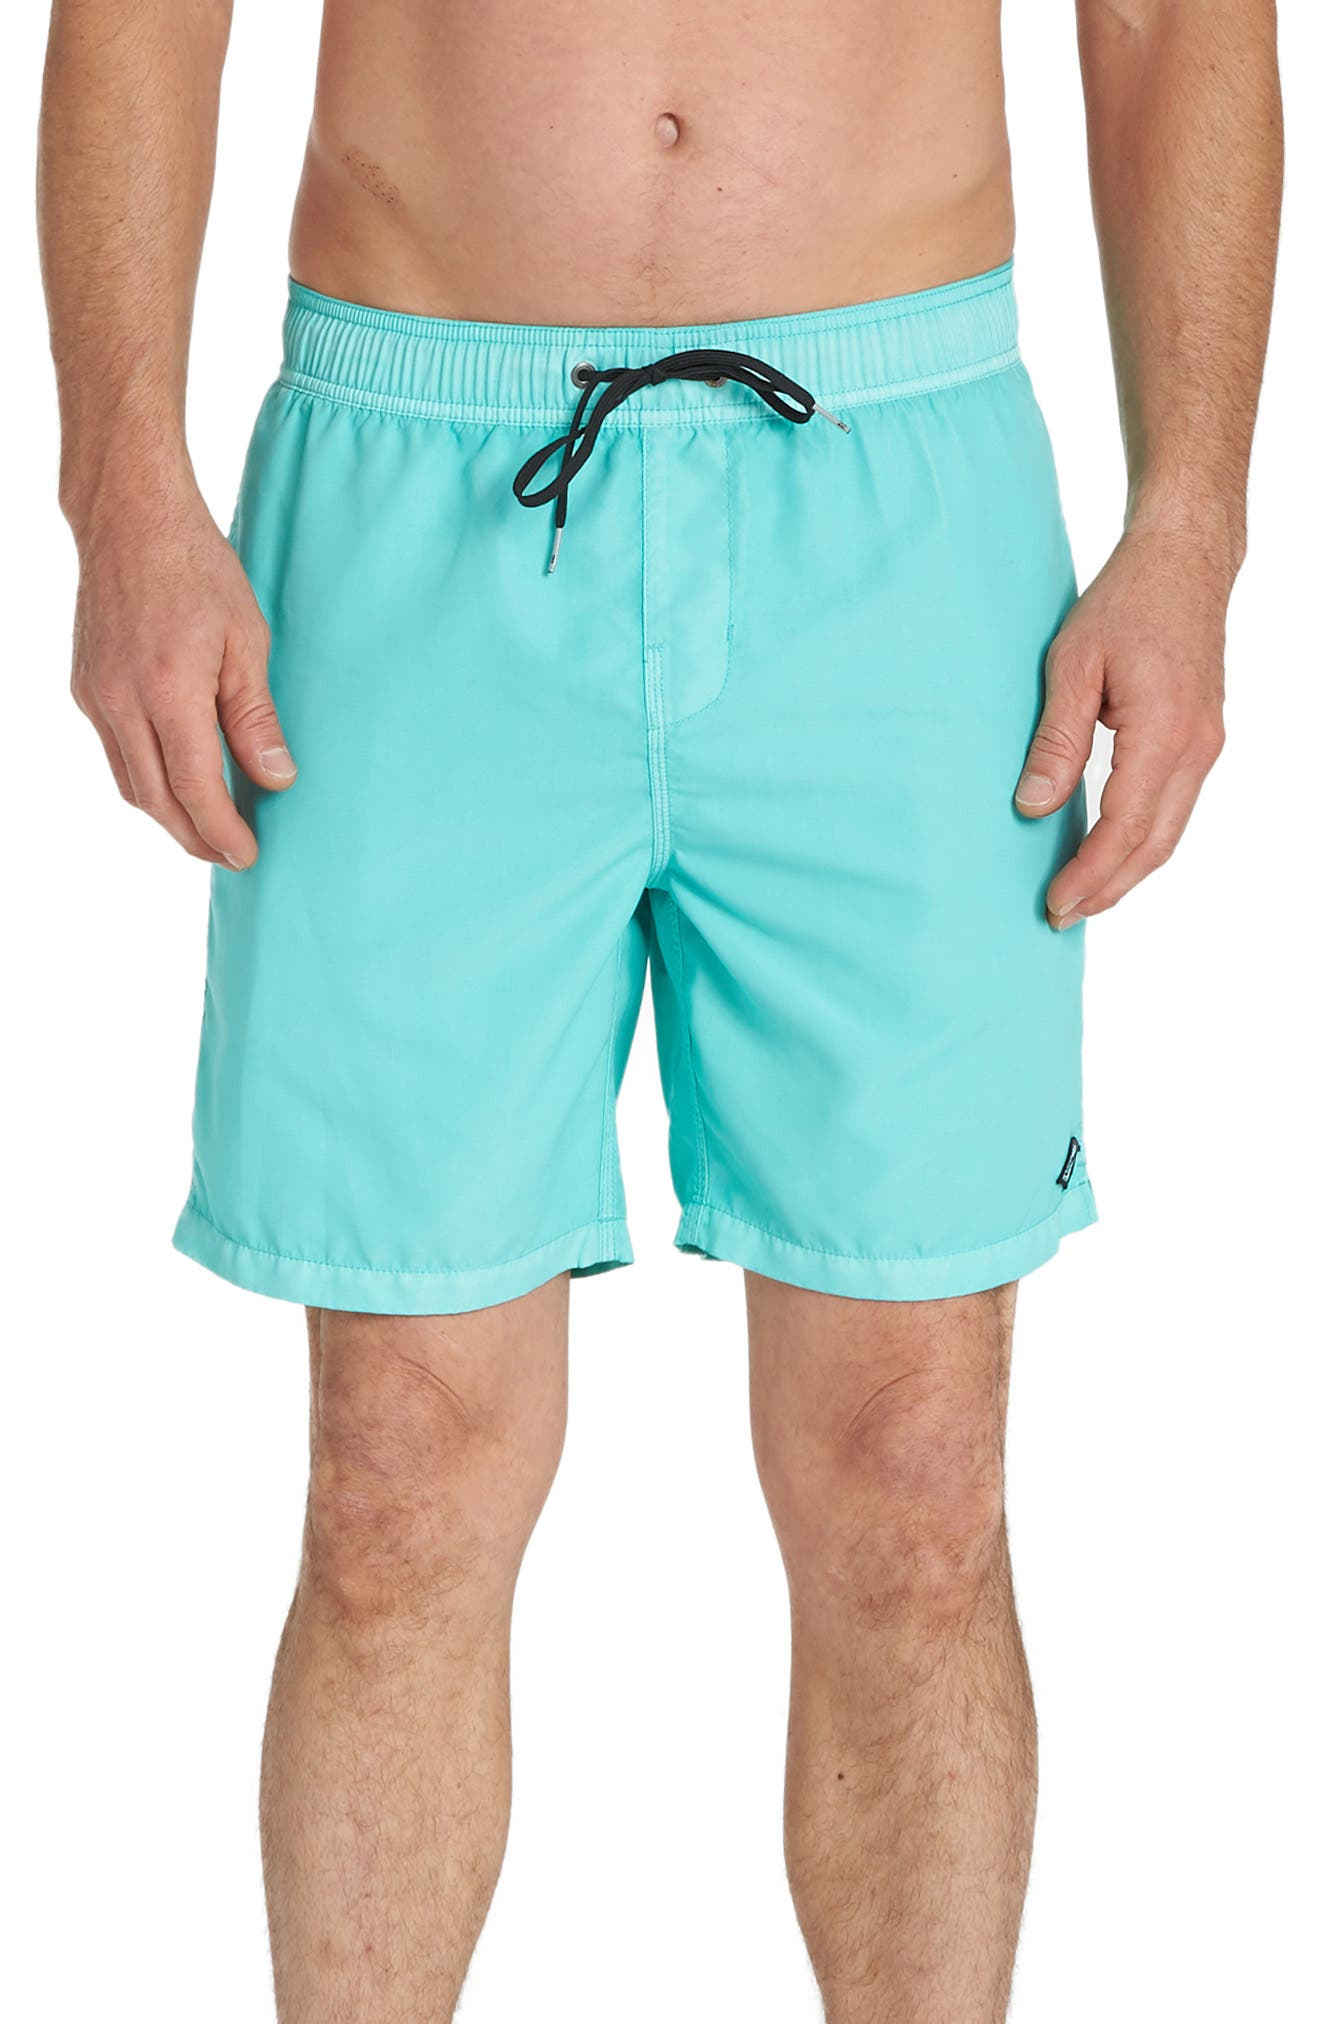 Billabong All Day Layback Swim Volley Trunks, Blue/green